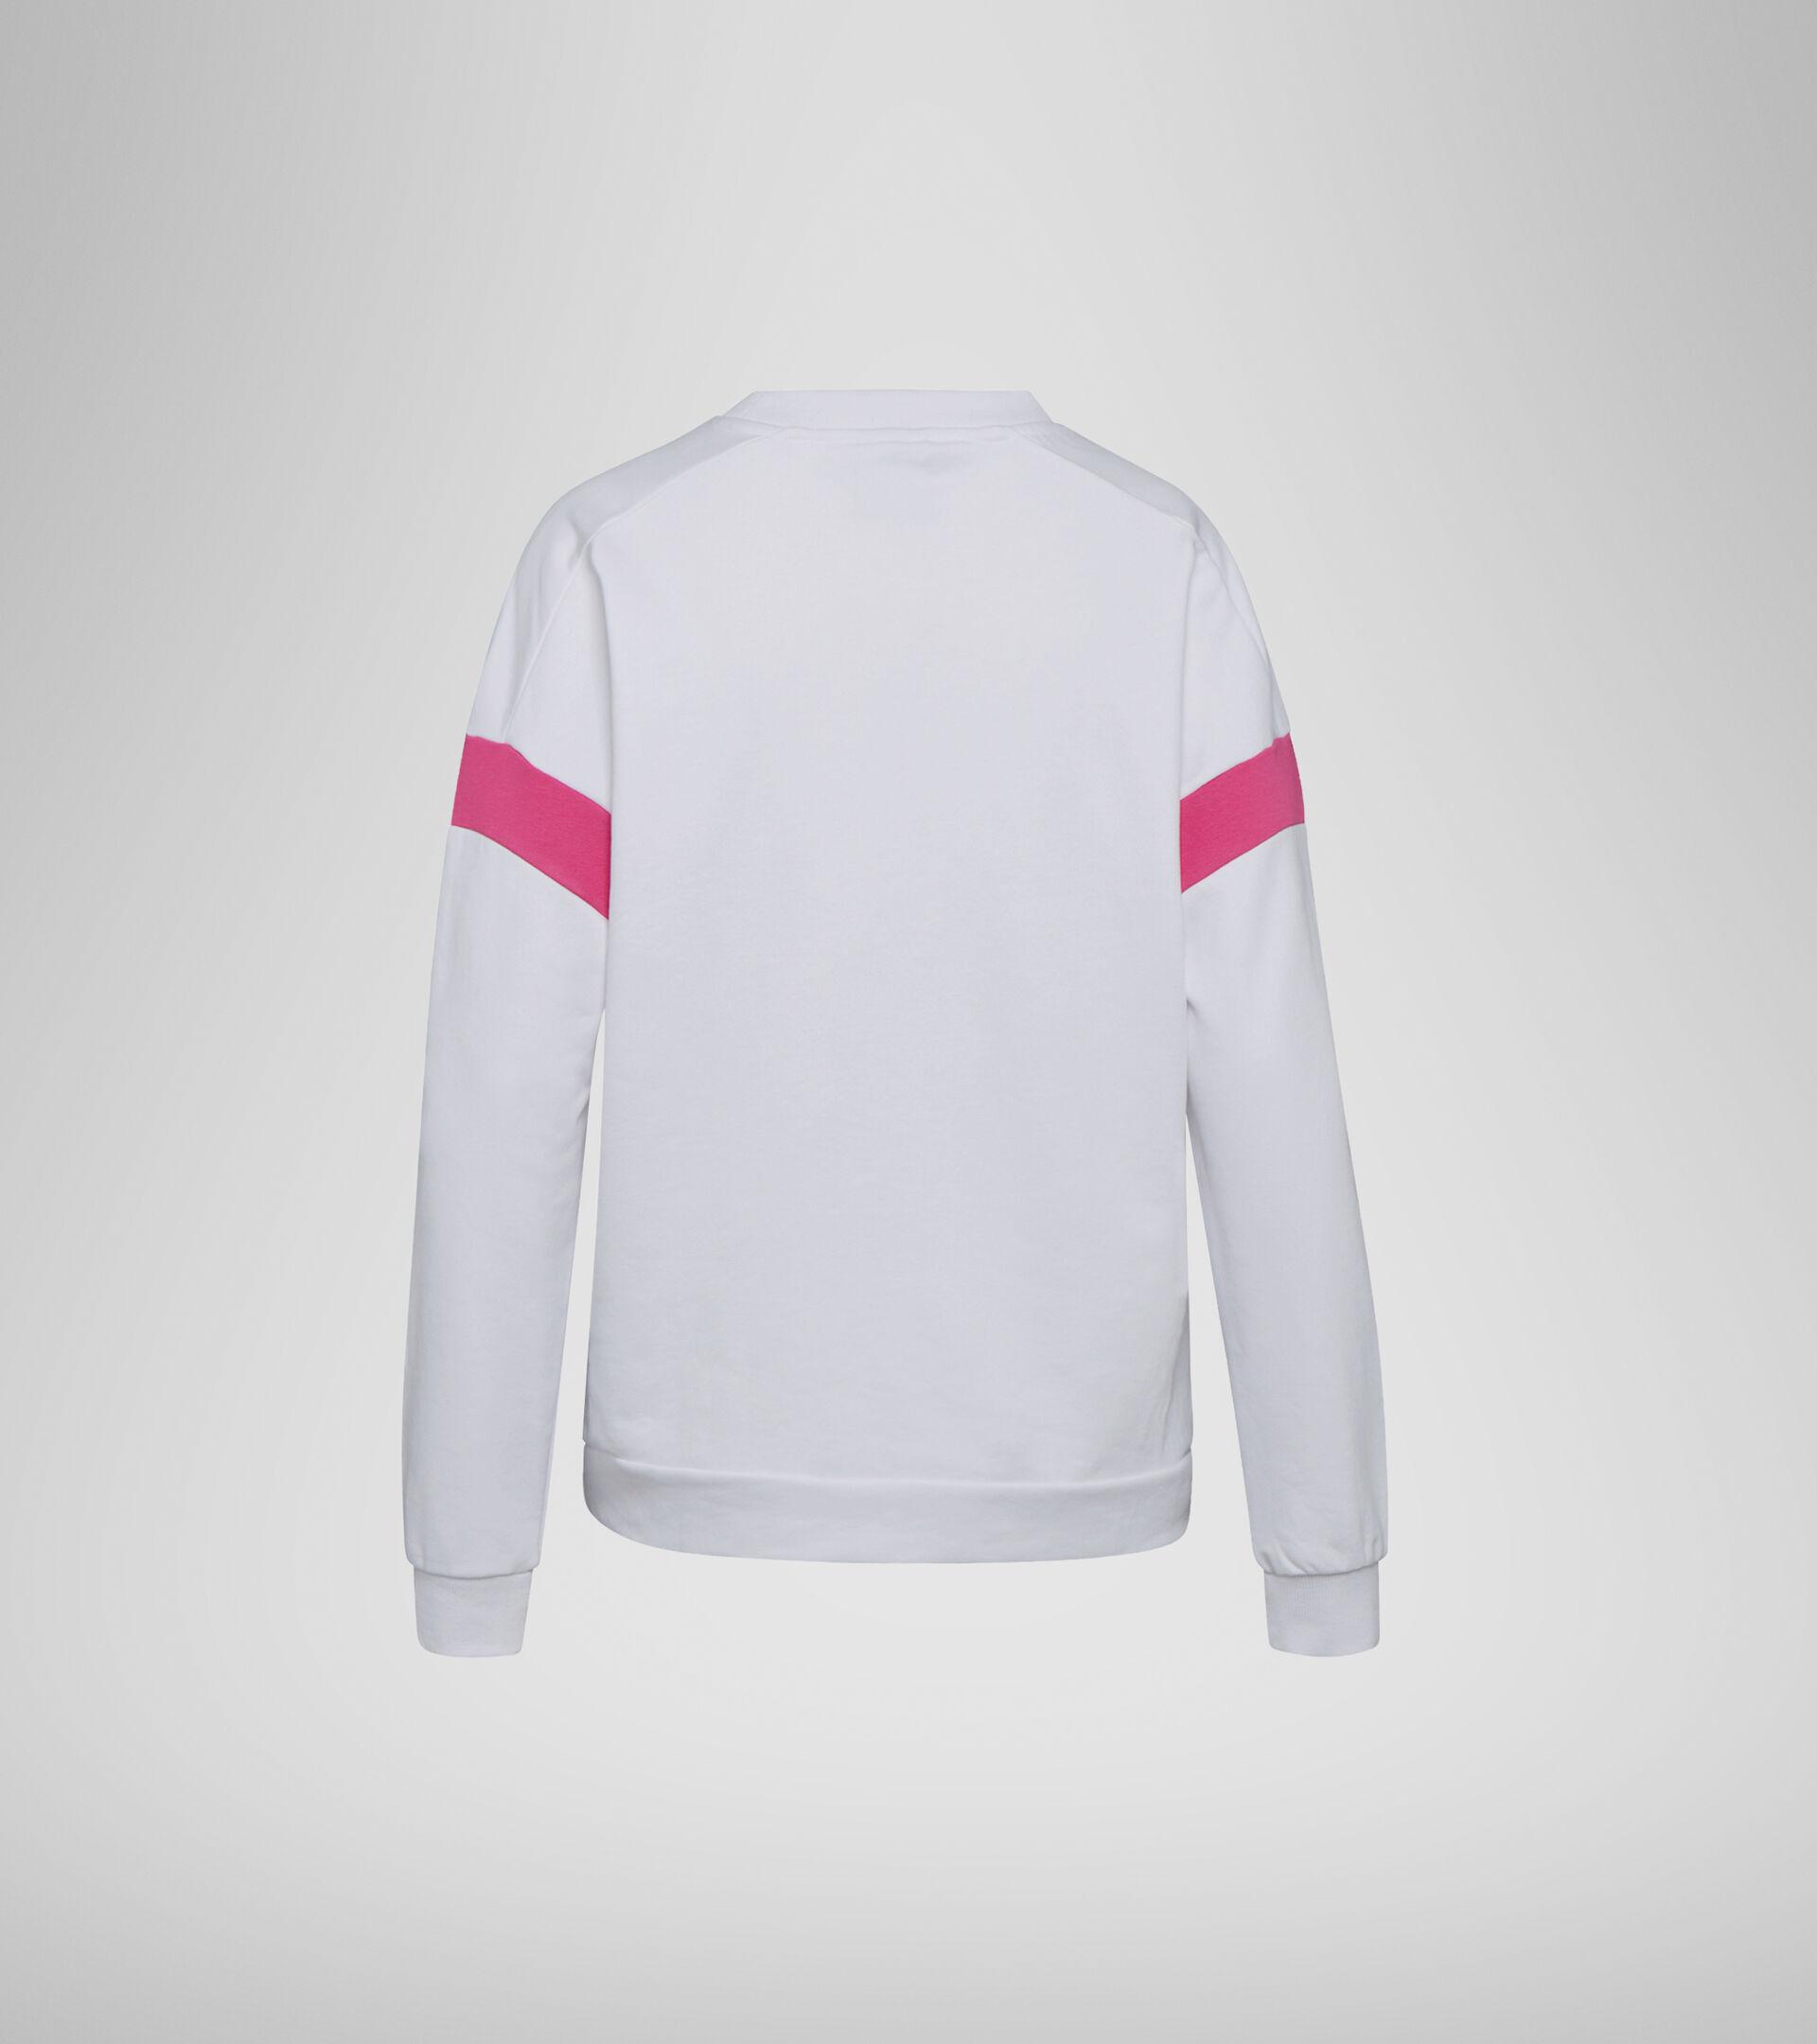 Apparel Sport DONNA L.SWEATSHIRT CREW SPOTLIGHT BIANCO OTTICO Diadora